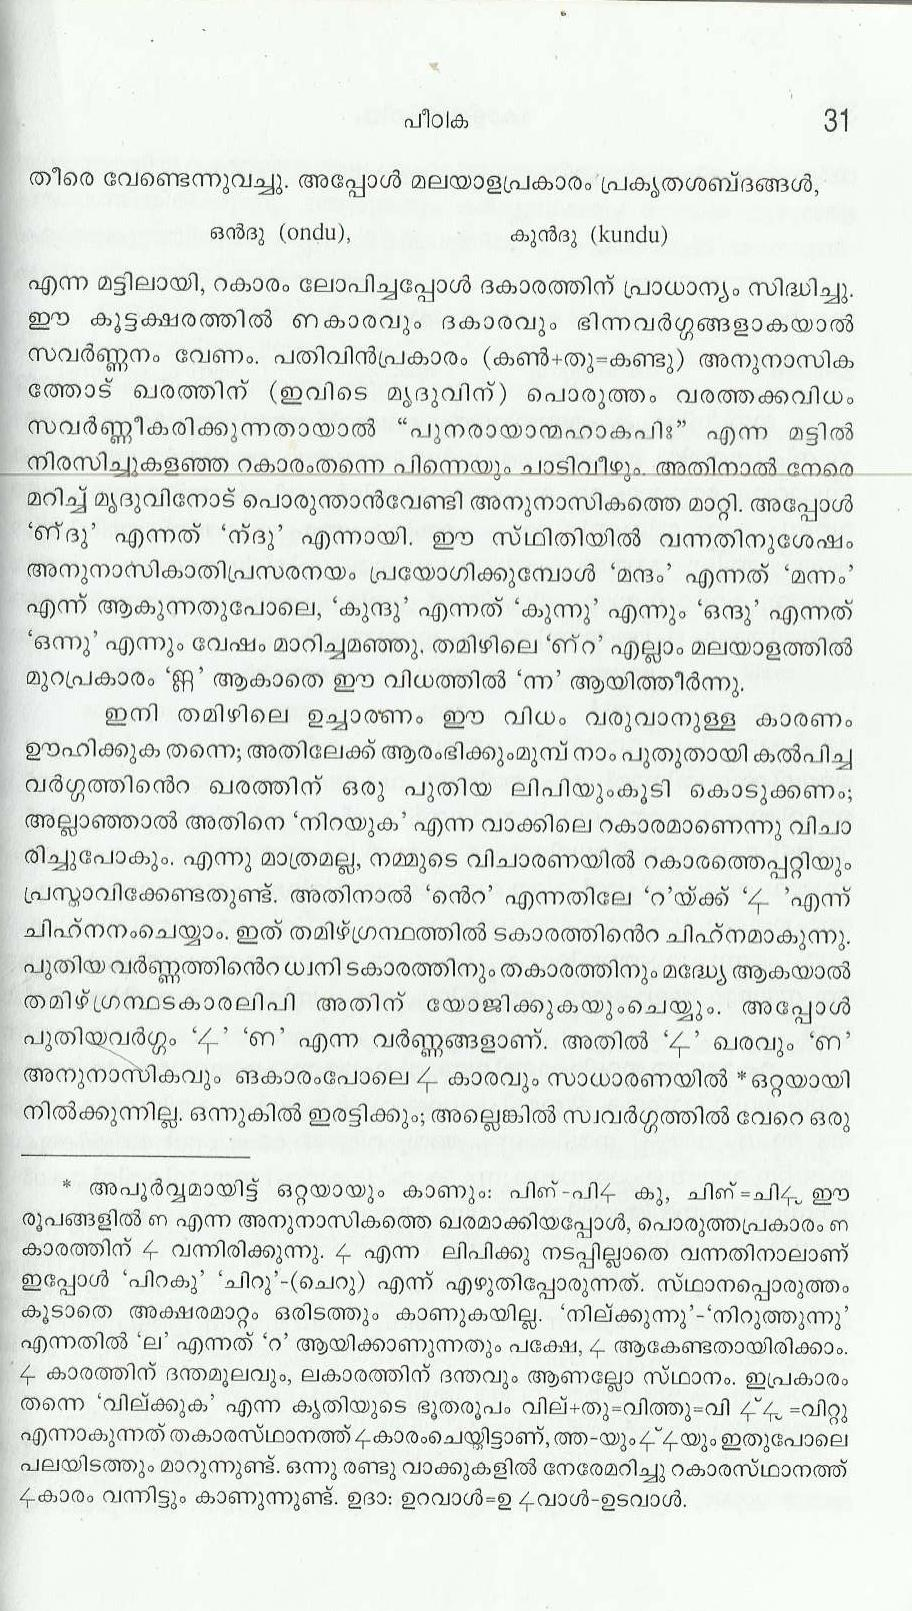 Keralapanineeyam page 31 - പീഠിക അദ്ധ്യായം